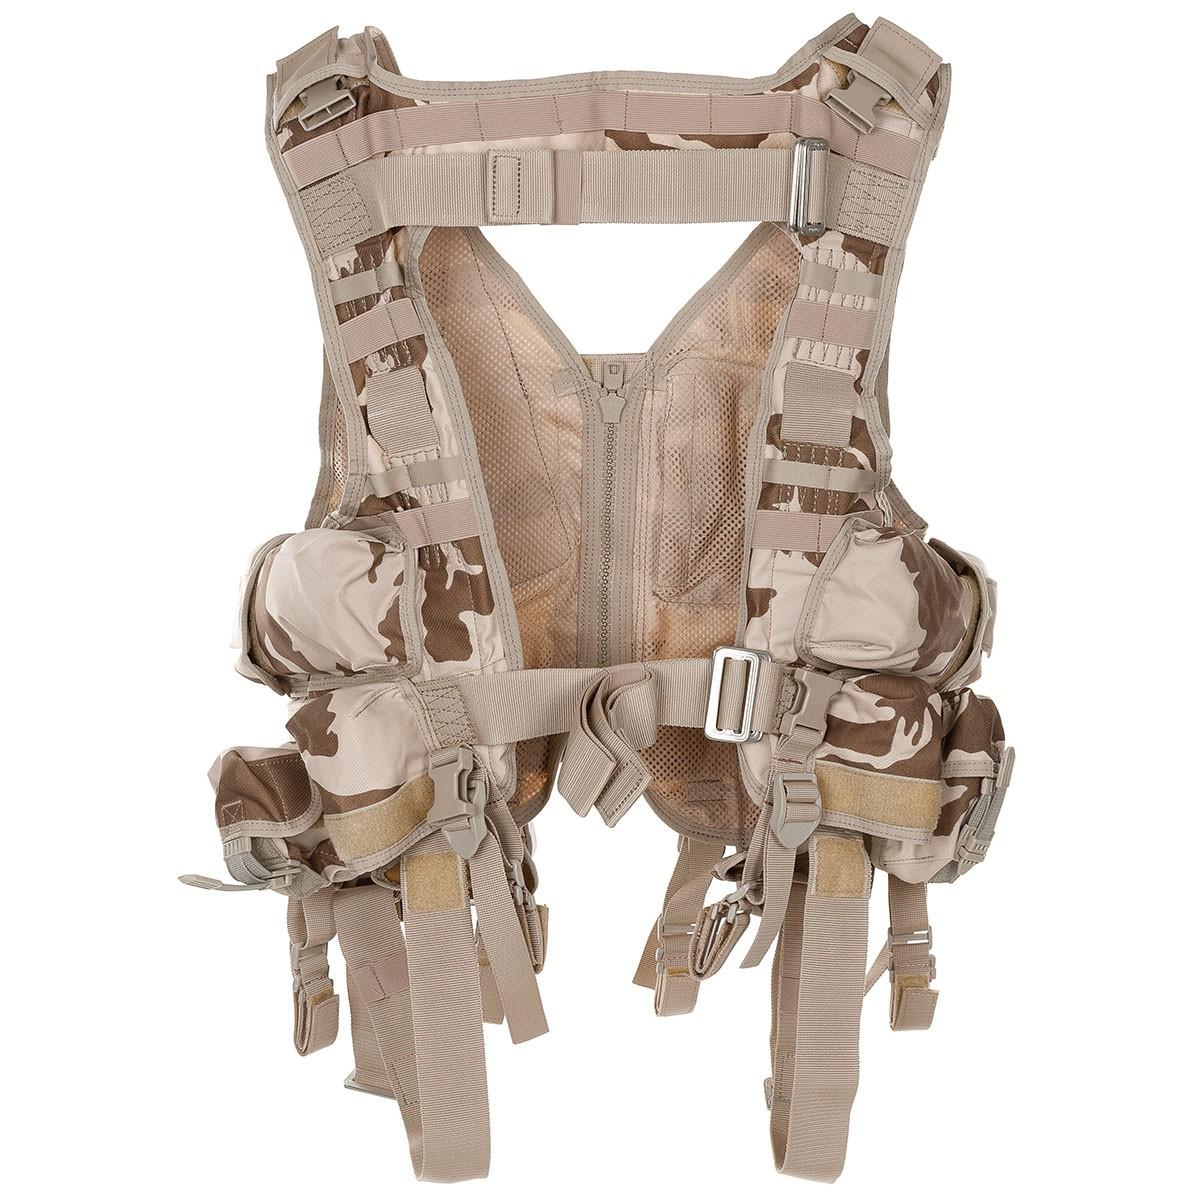 CZ Tactical Weste M 95 desert